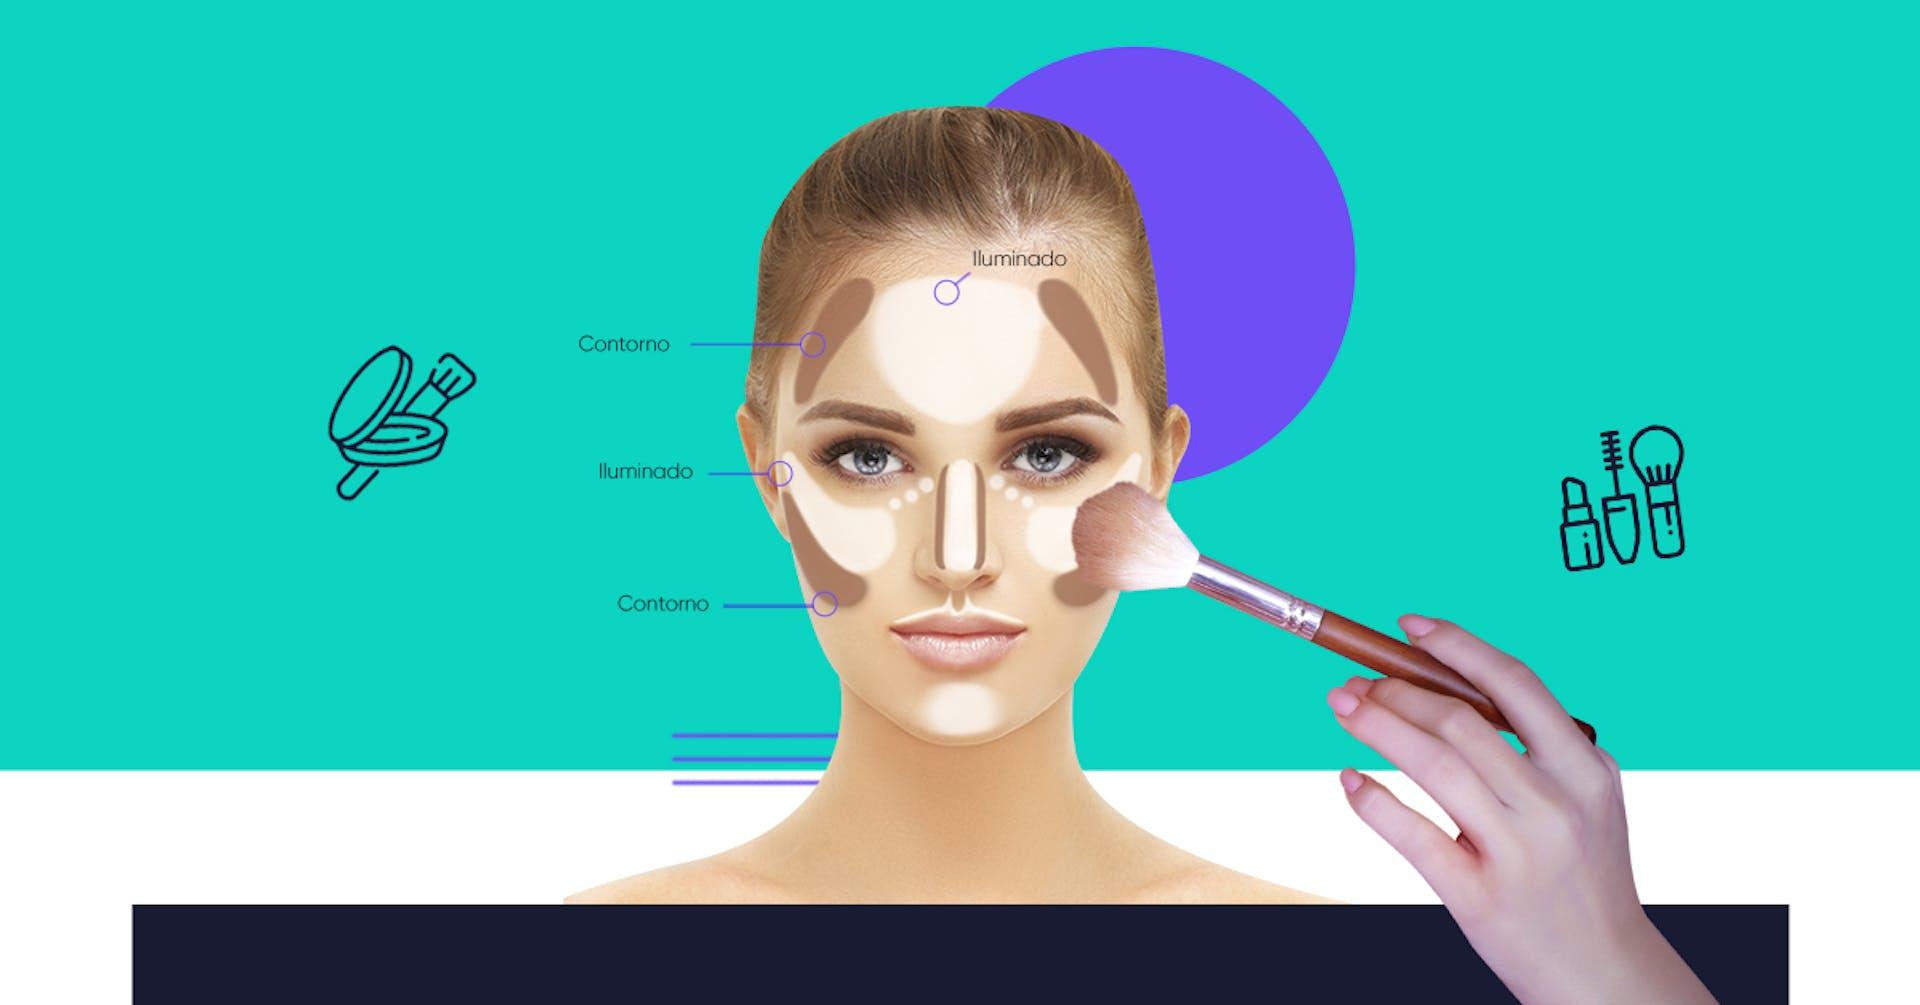 Contouring en el maquillaje: luce espectacular con la técnica de JLo